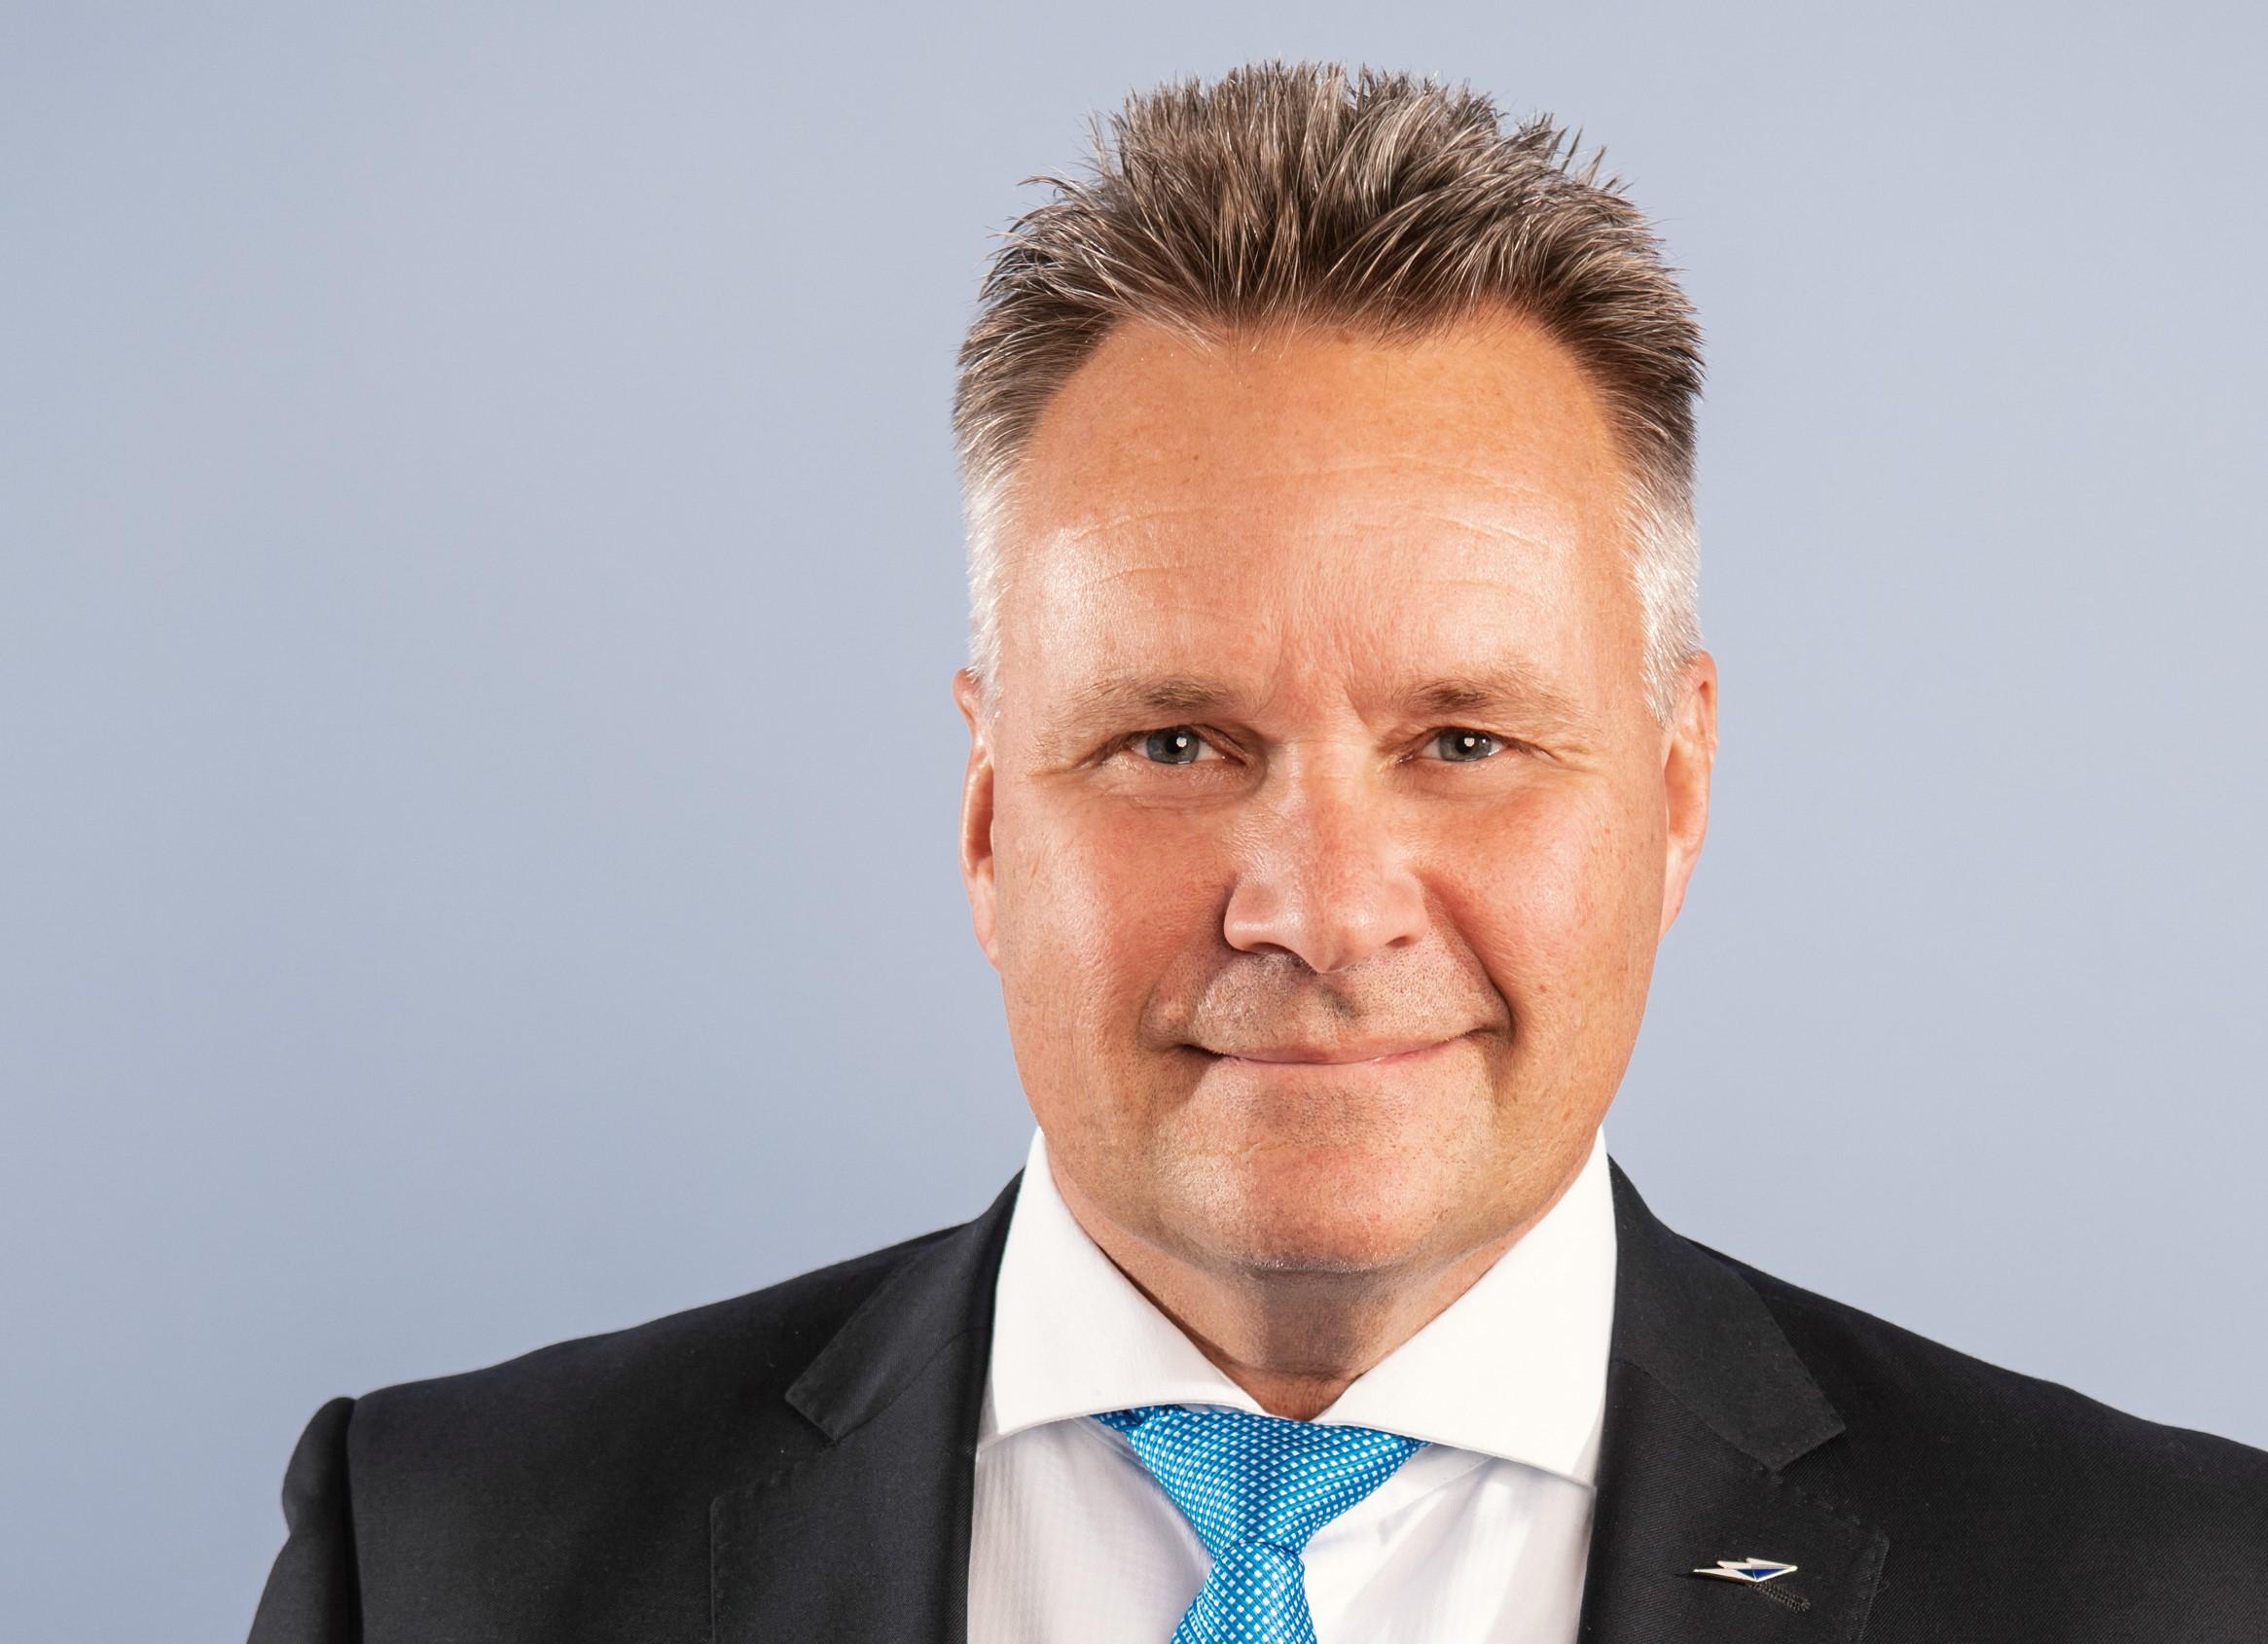 Ola Hansson, chef for Lufthansas hub i München Lufthavn.. (Foto: Lufthansa PR)